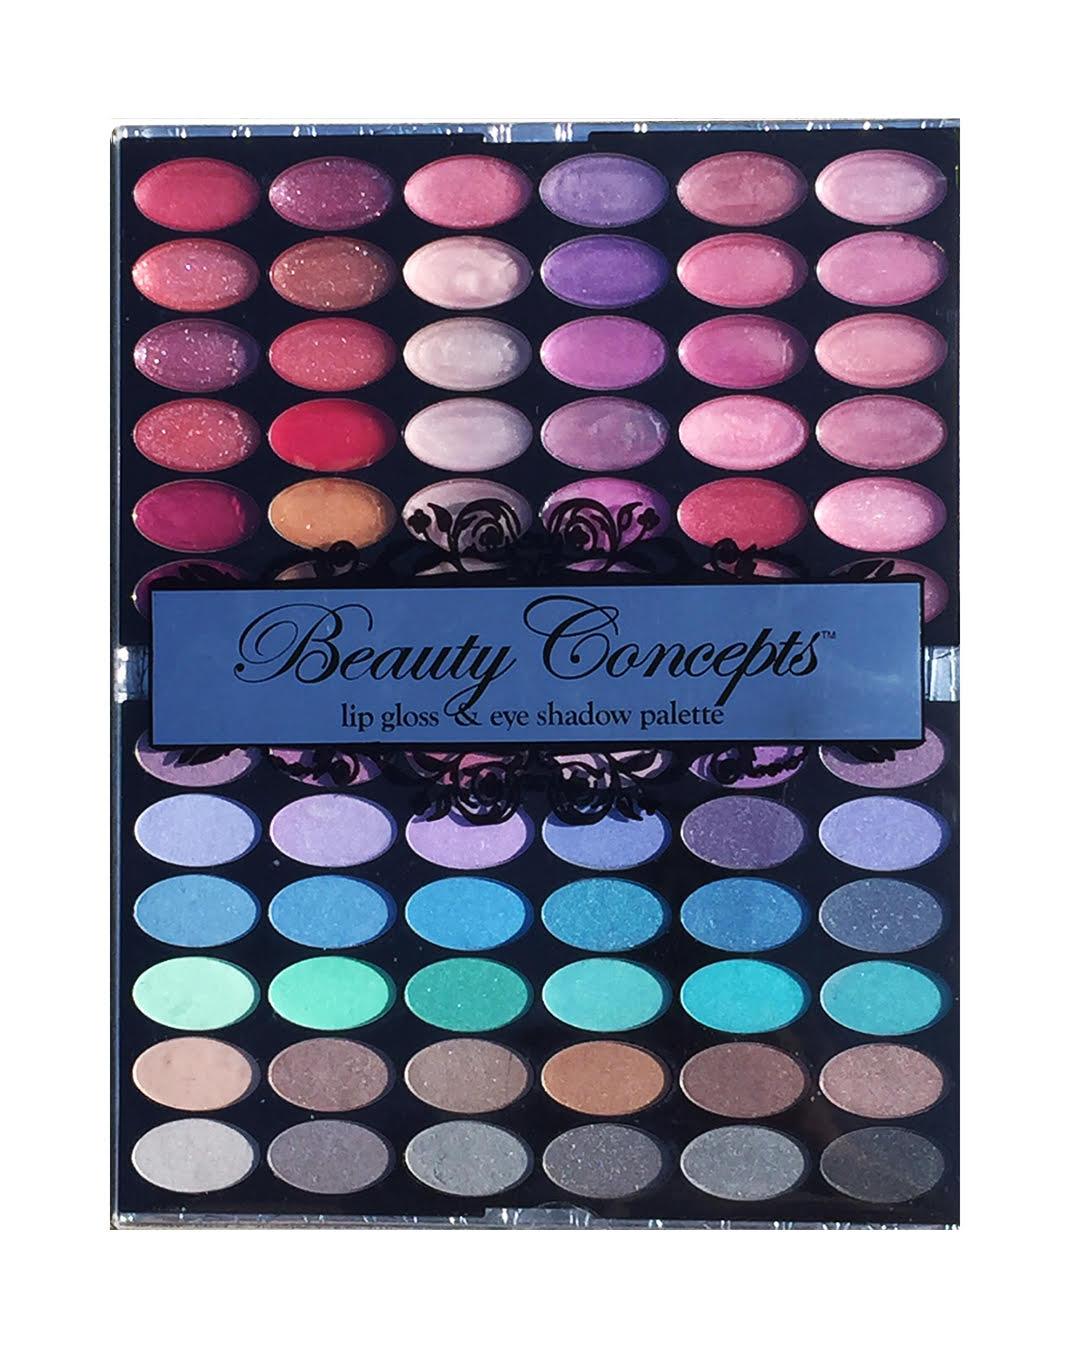 Beauty Concepts Lip Gloss  amp  Eye Shadow Palette